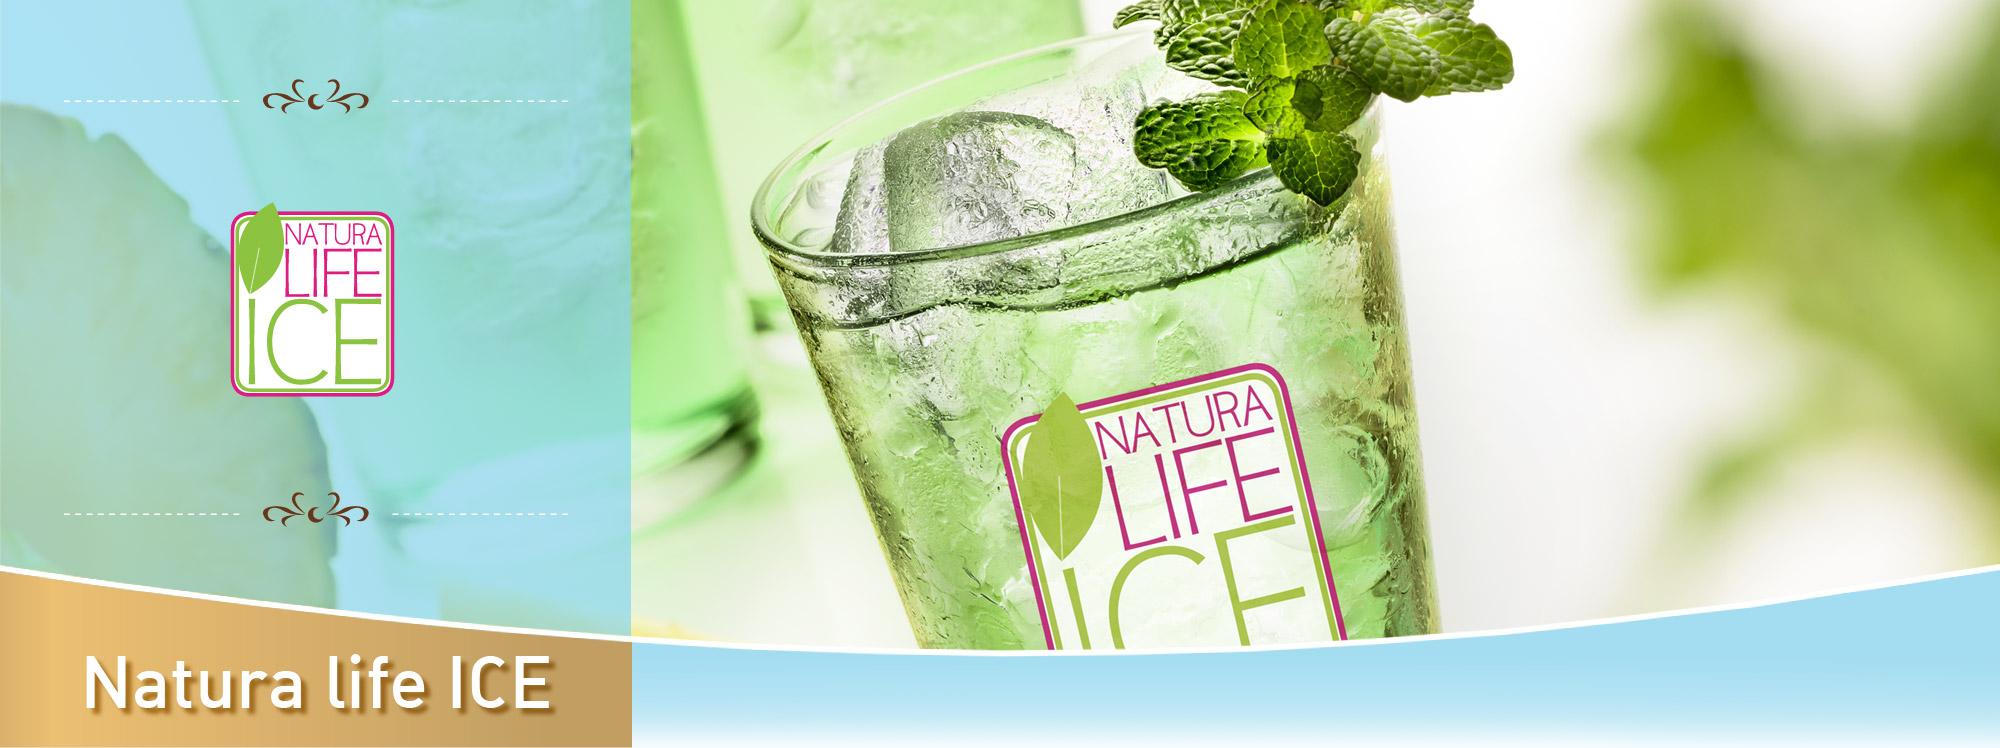 SlideNL-ICE-mixShake-Referenza-2